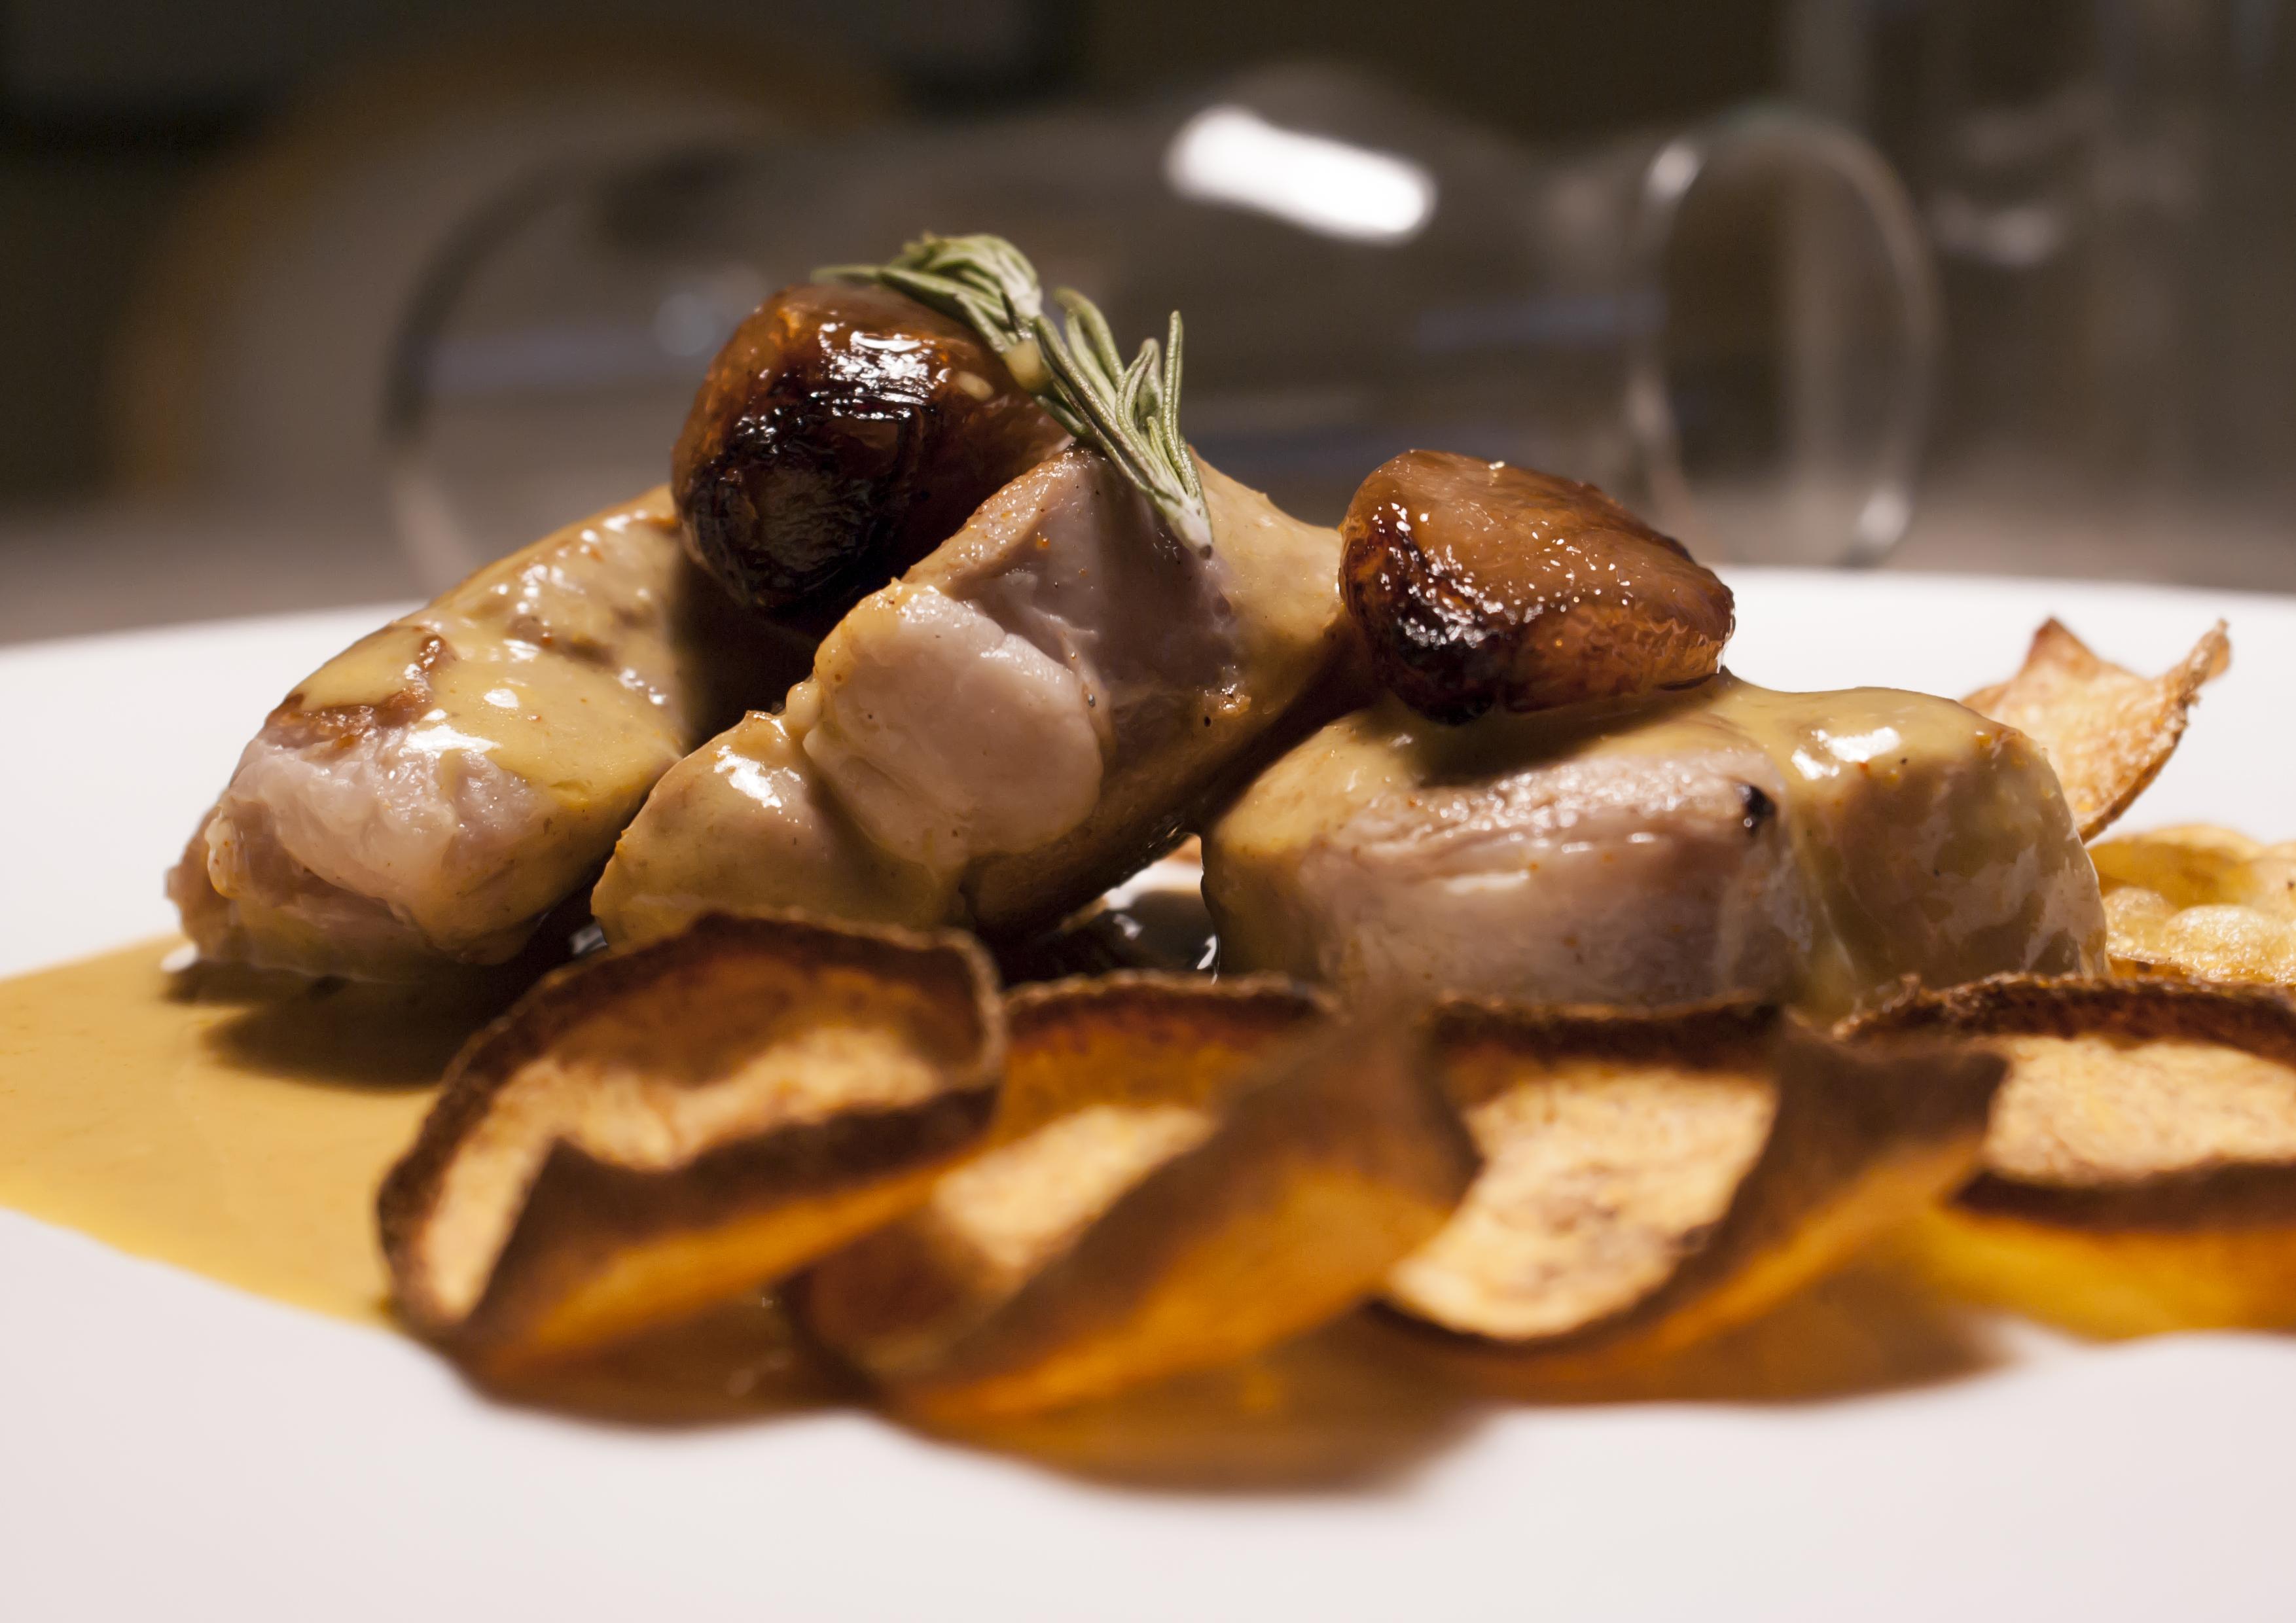 solomillo-de-cerdo-iberico-con-salsa-de-coco-al-curry-rojo